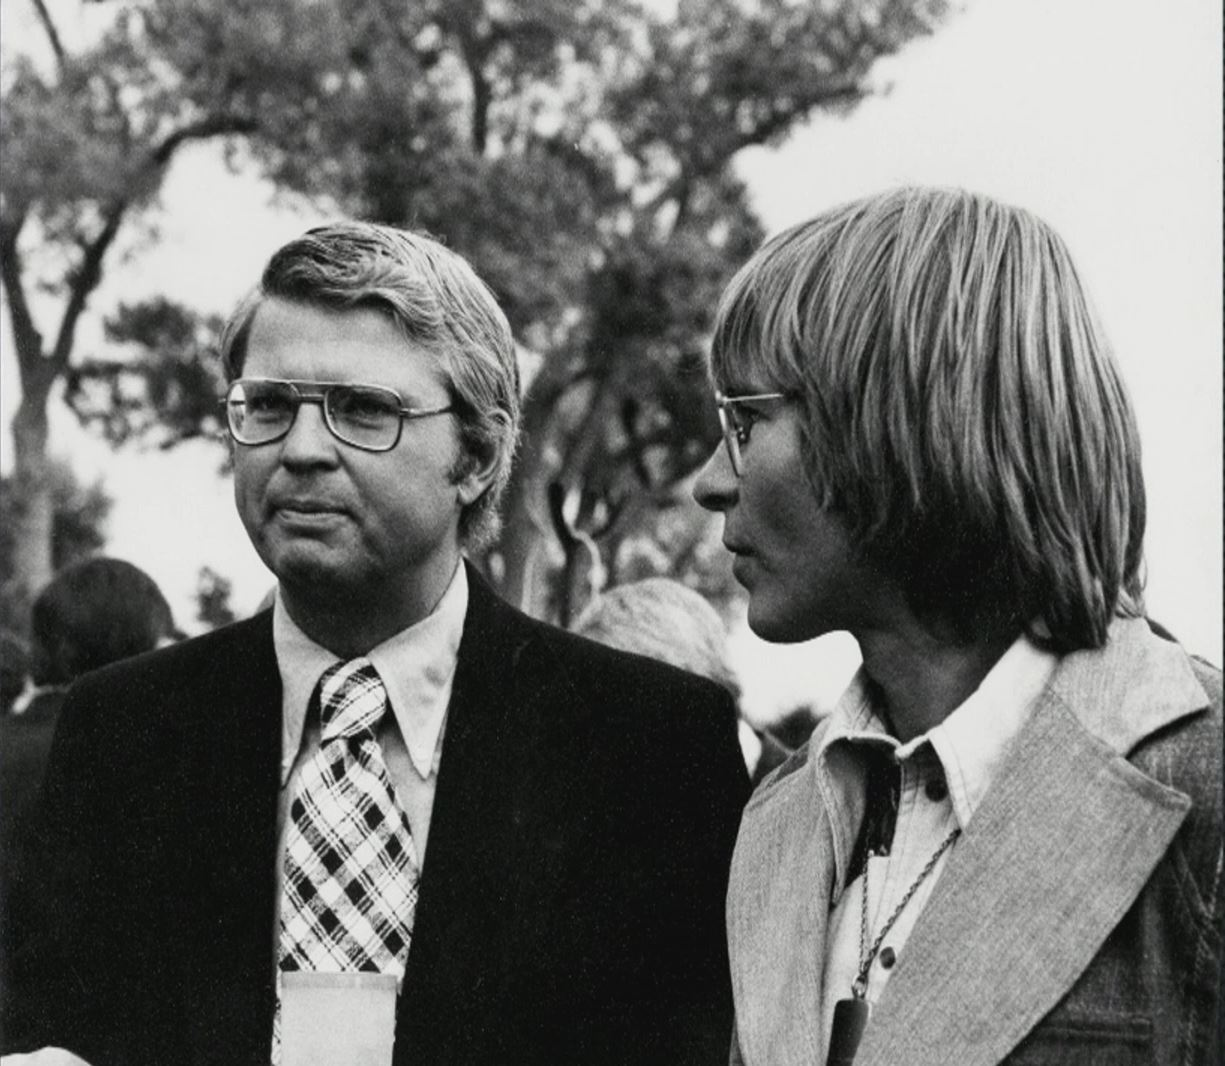 Governor Dick Lamm (left) standing with John Denver (right)